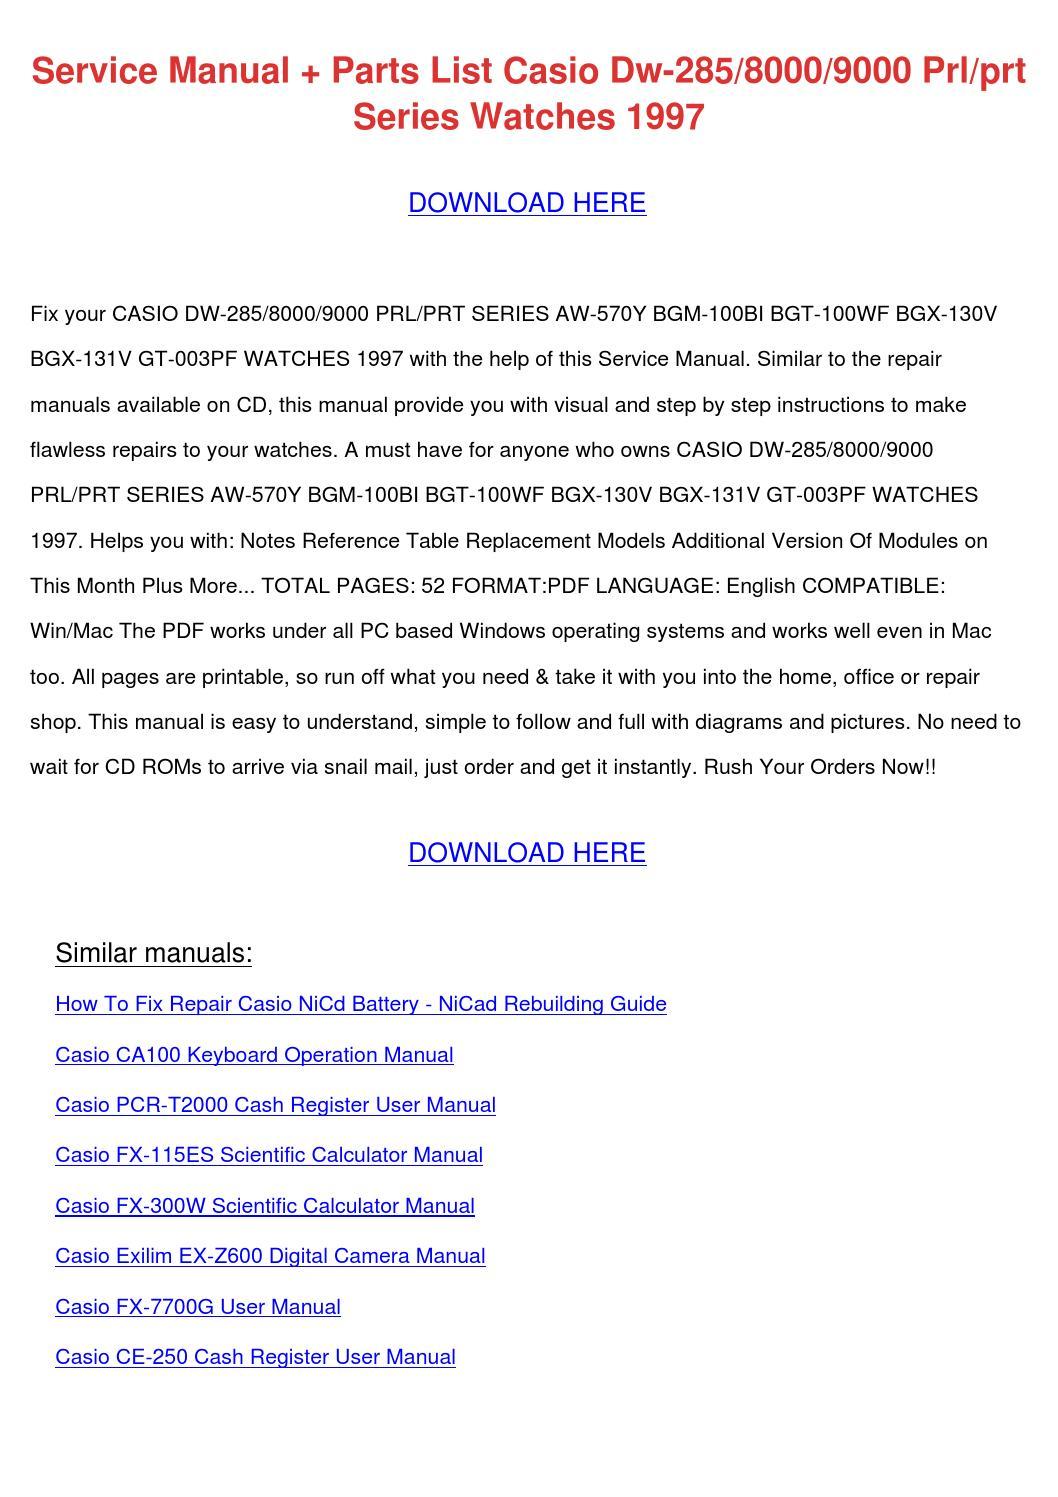 Service Manual Parts List Casio Dw 2858000900 By Seanroach border=